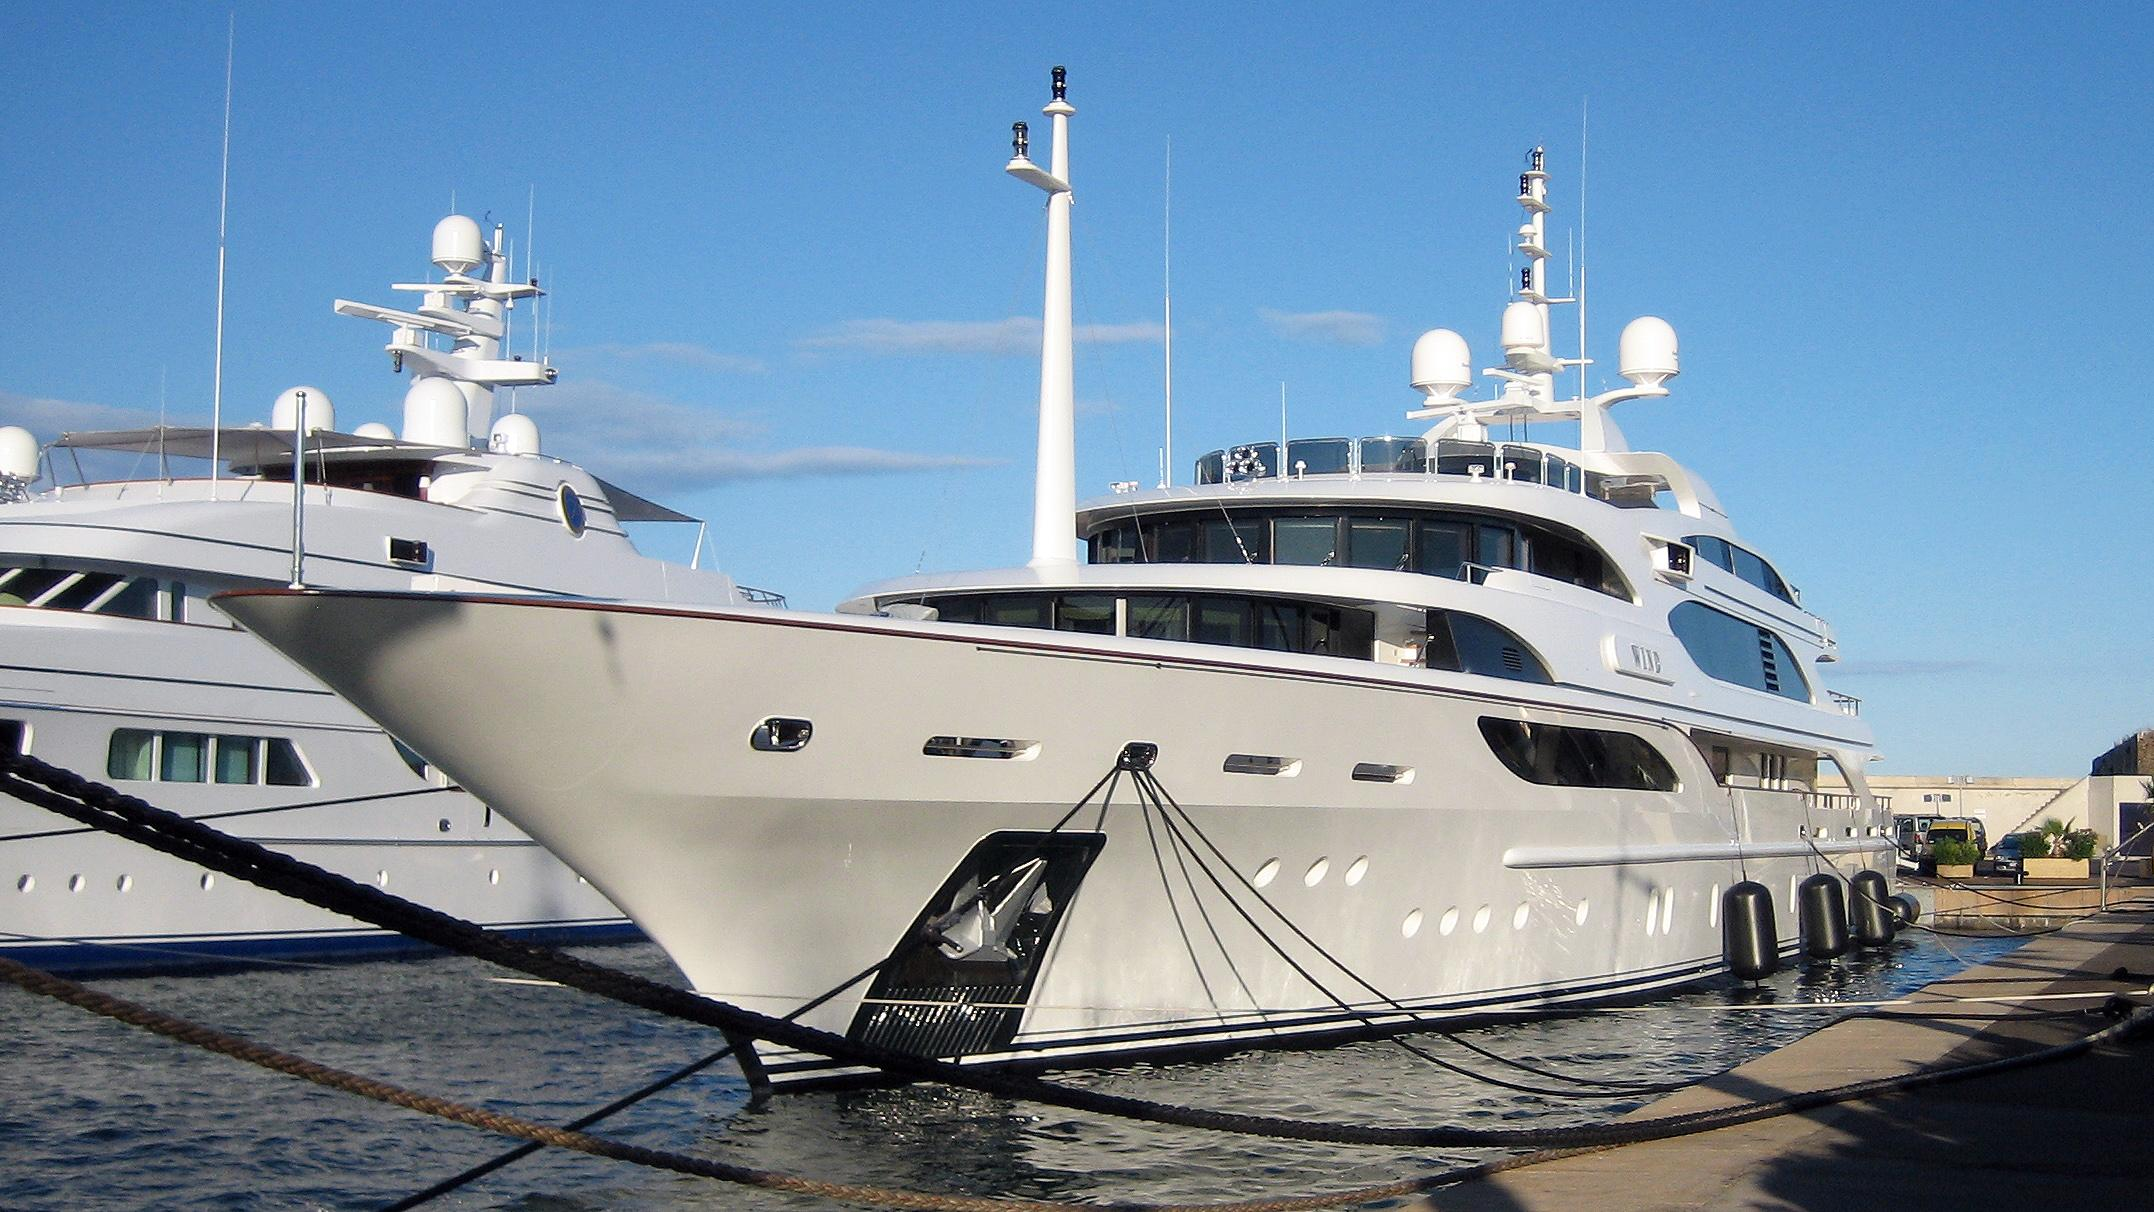 galkynys-motor-yacht-benetti-2007-59m-bow